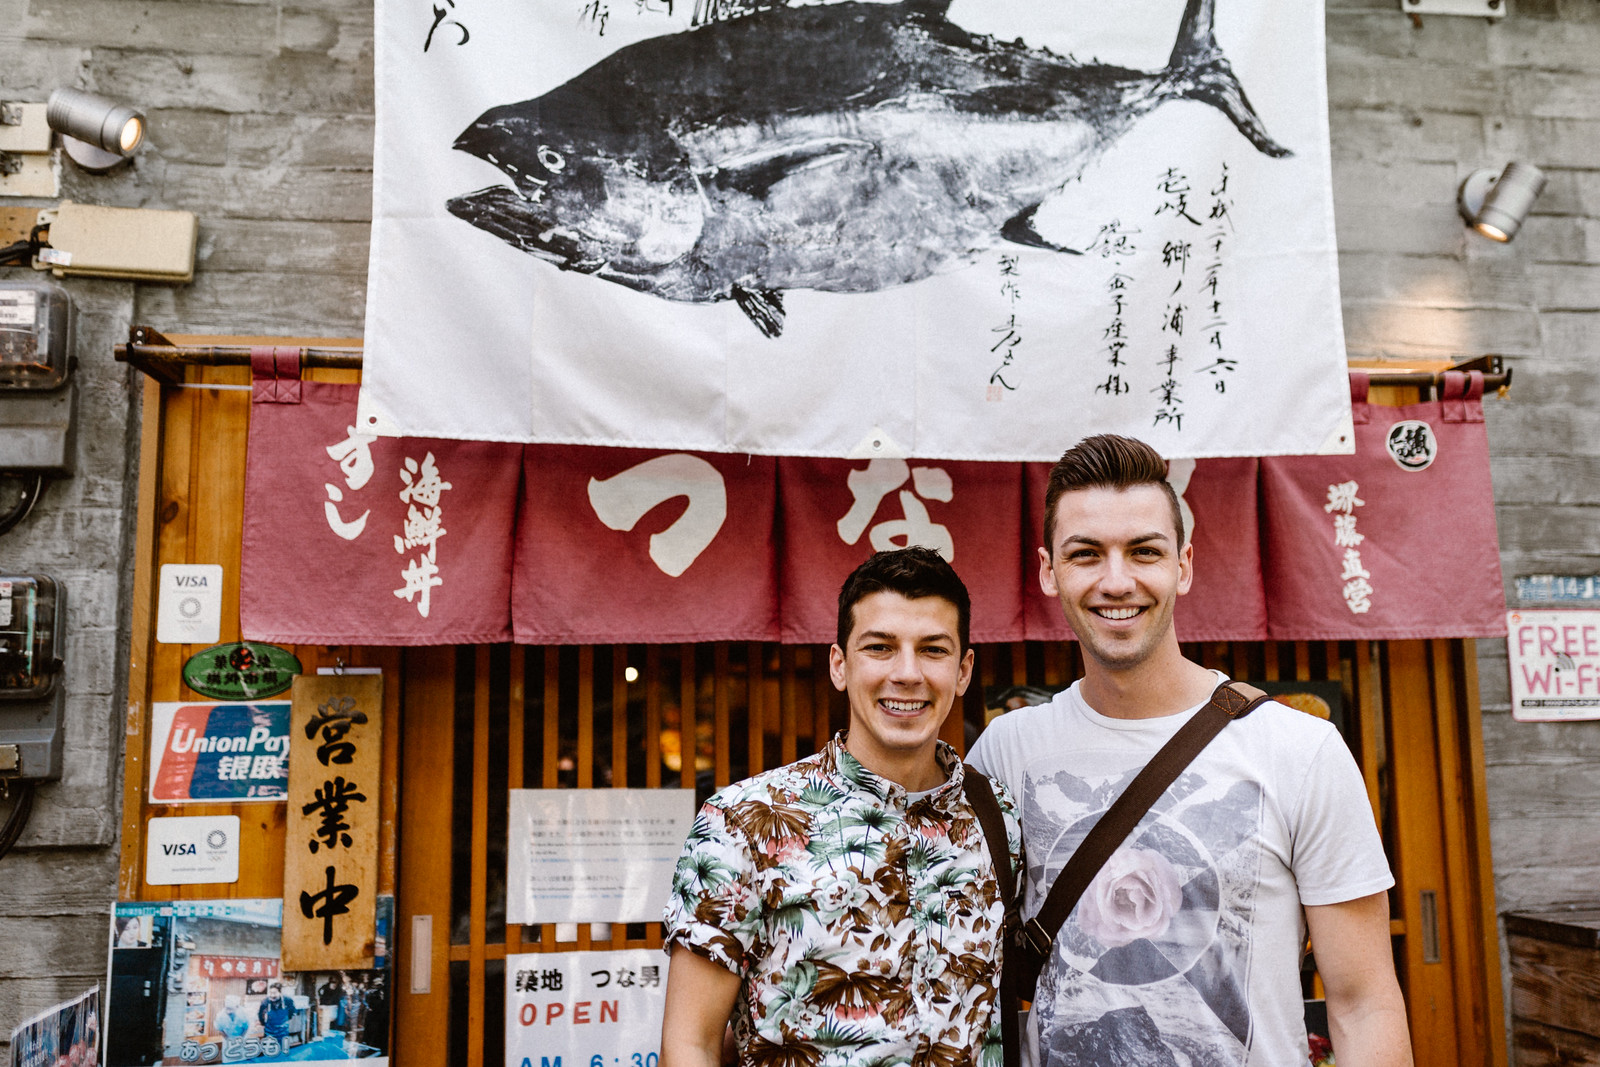 Matthew and Michael gay husbands in front of sushi restaurant tsukiki market Tokyo Japan